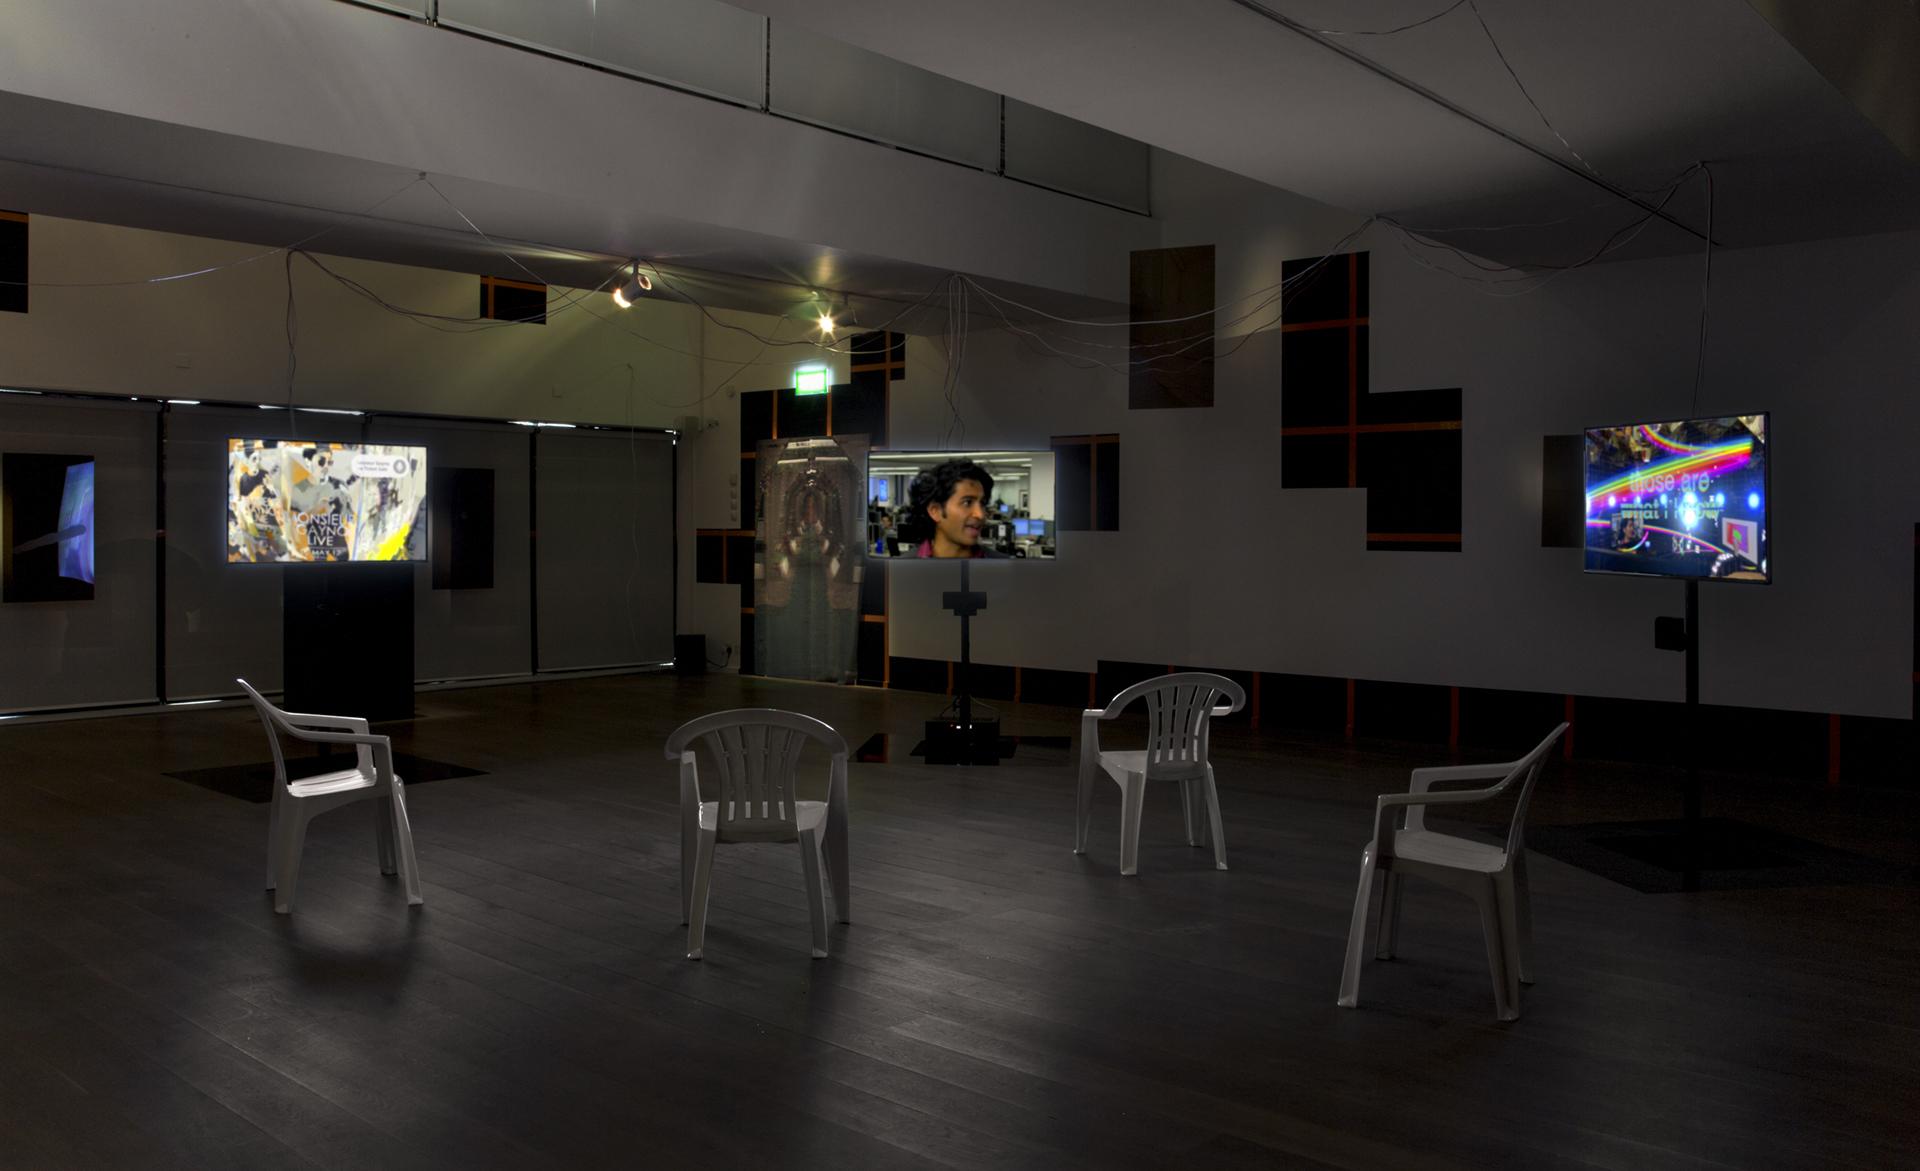 Installation view Gallery 2, Solstice Arts Centre, Ireland.